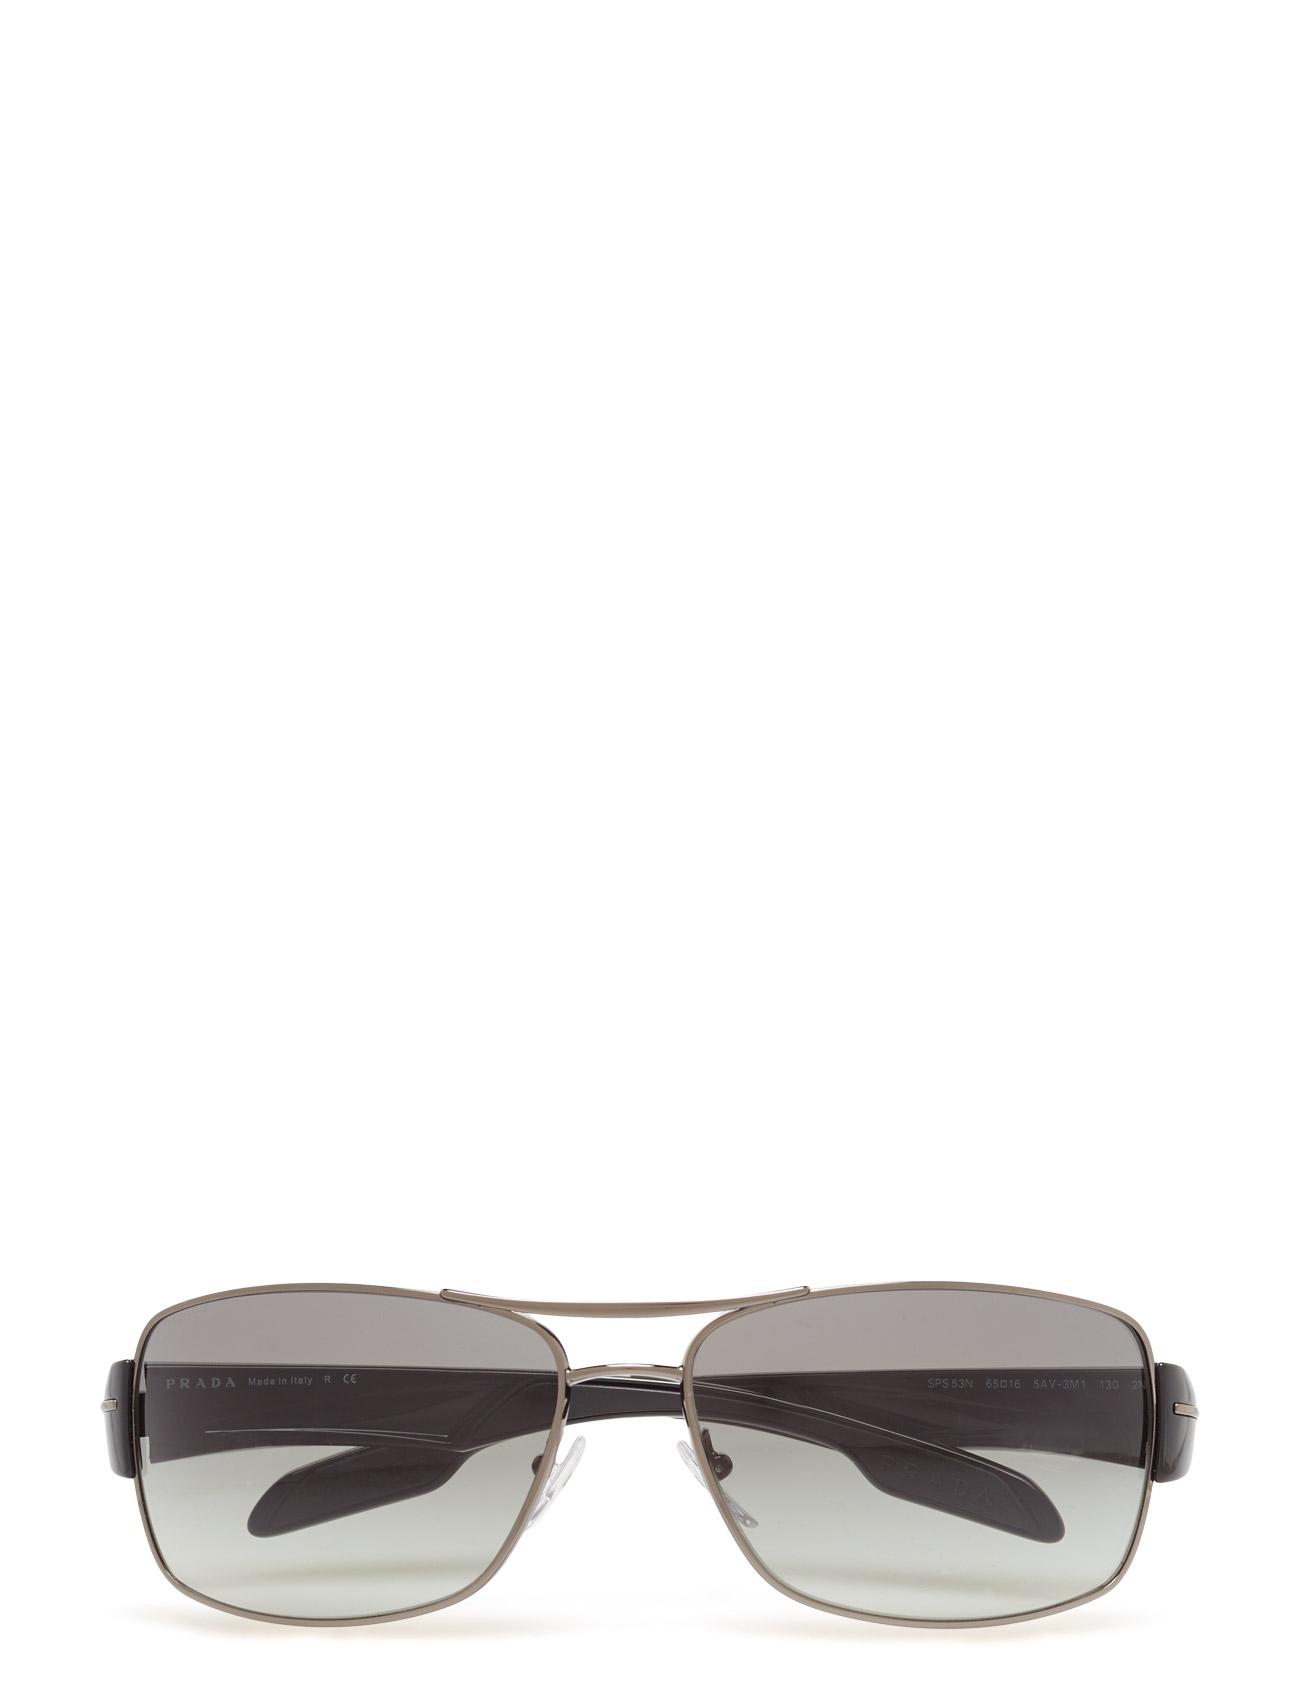 99f7ea7da7d8 Active Prada Sport Sunglasses Solbriller til Herrer i